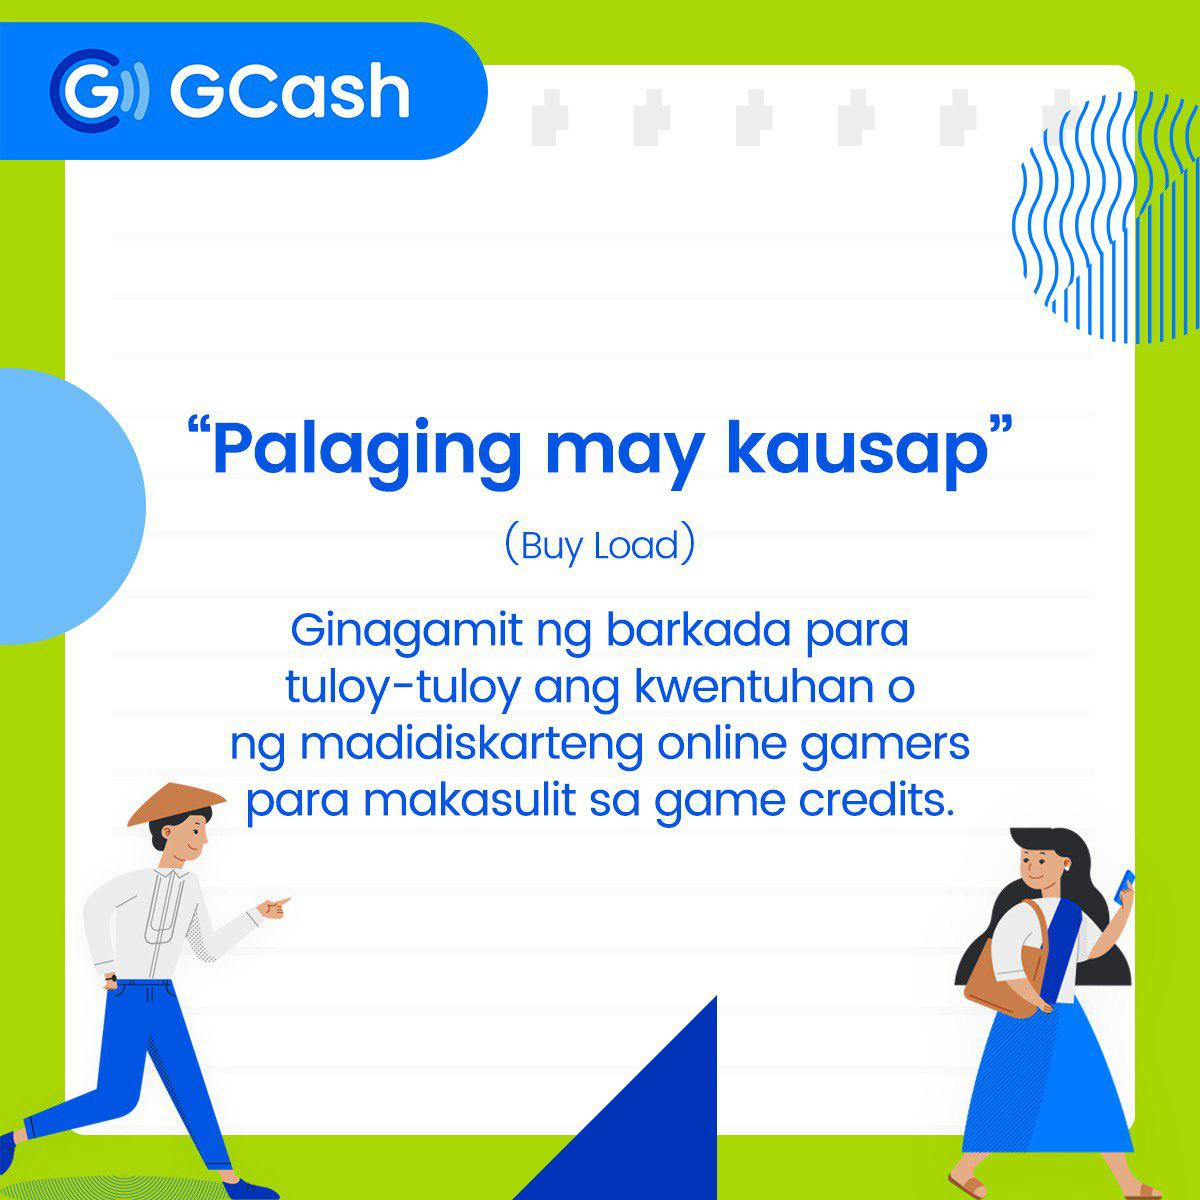 GCash (@gcashofficial) | Twitter